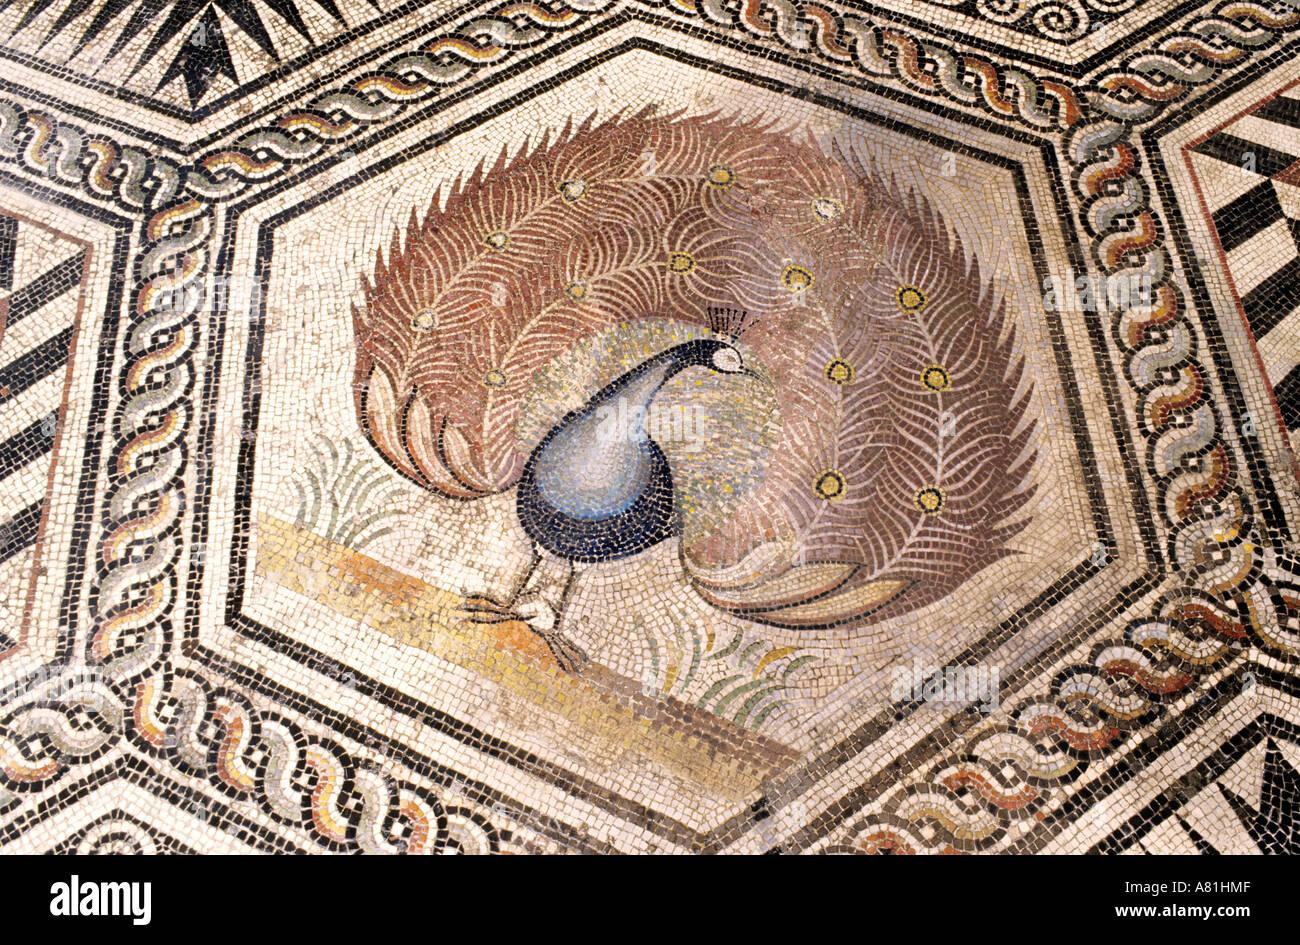 France vaucluse vaison la romaine villa of the peacock mosaic stock photo - La villa romaine antique ...